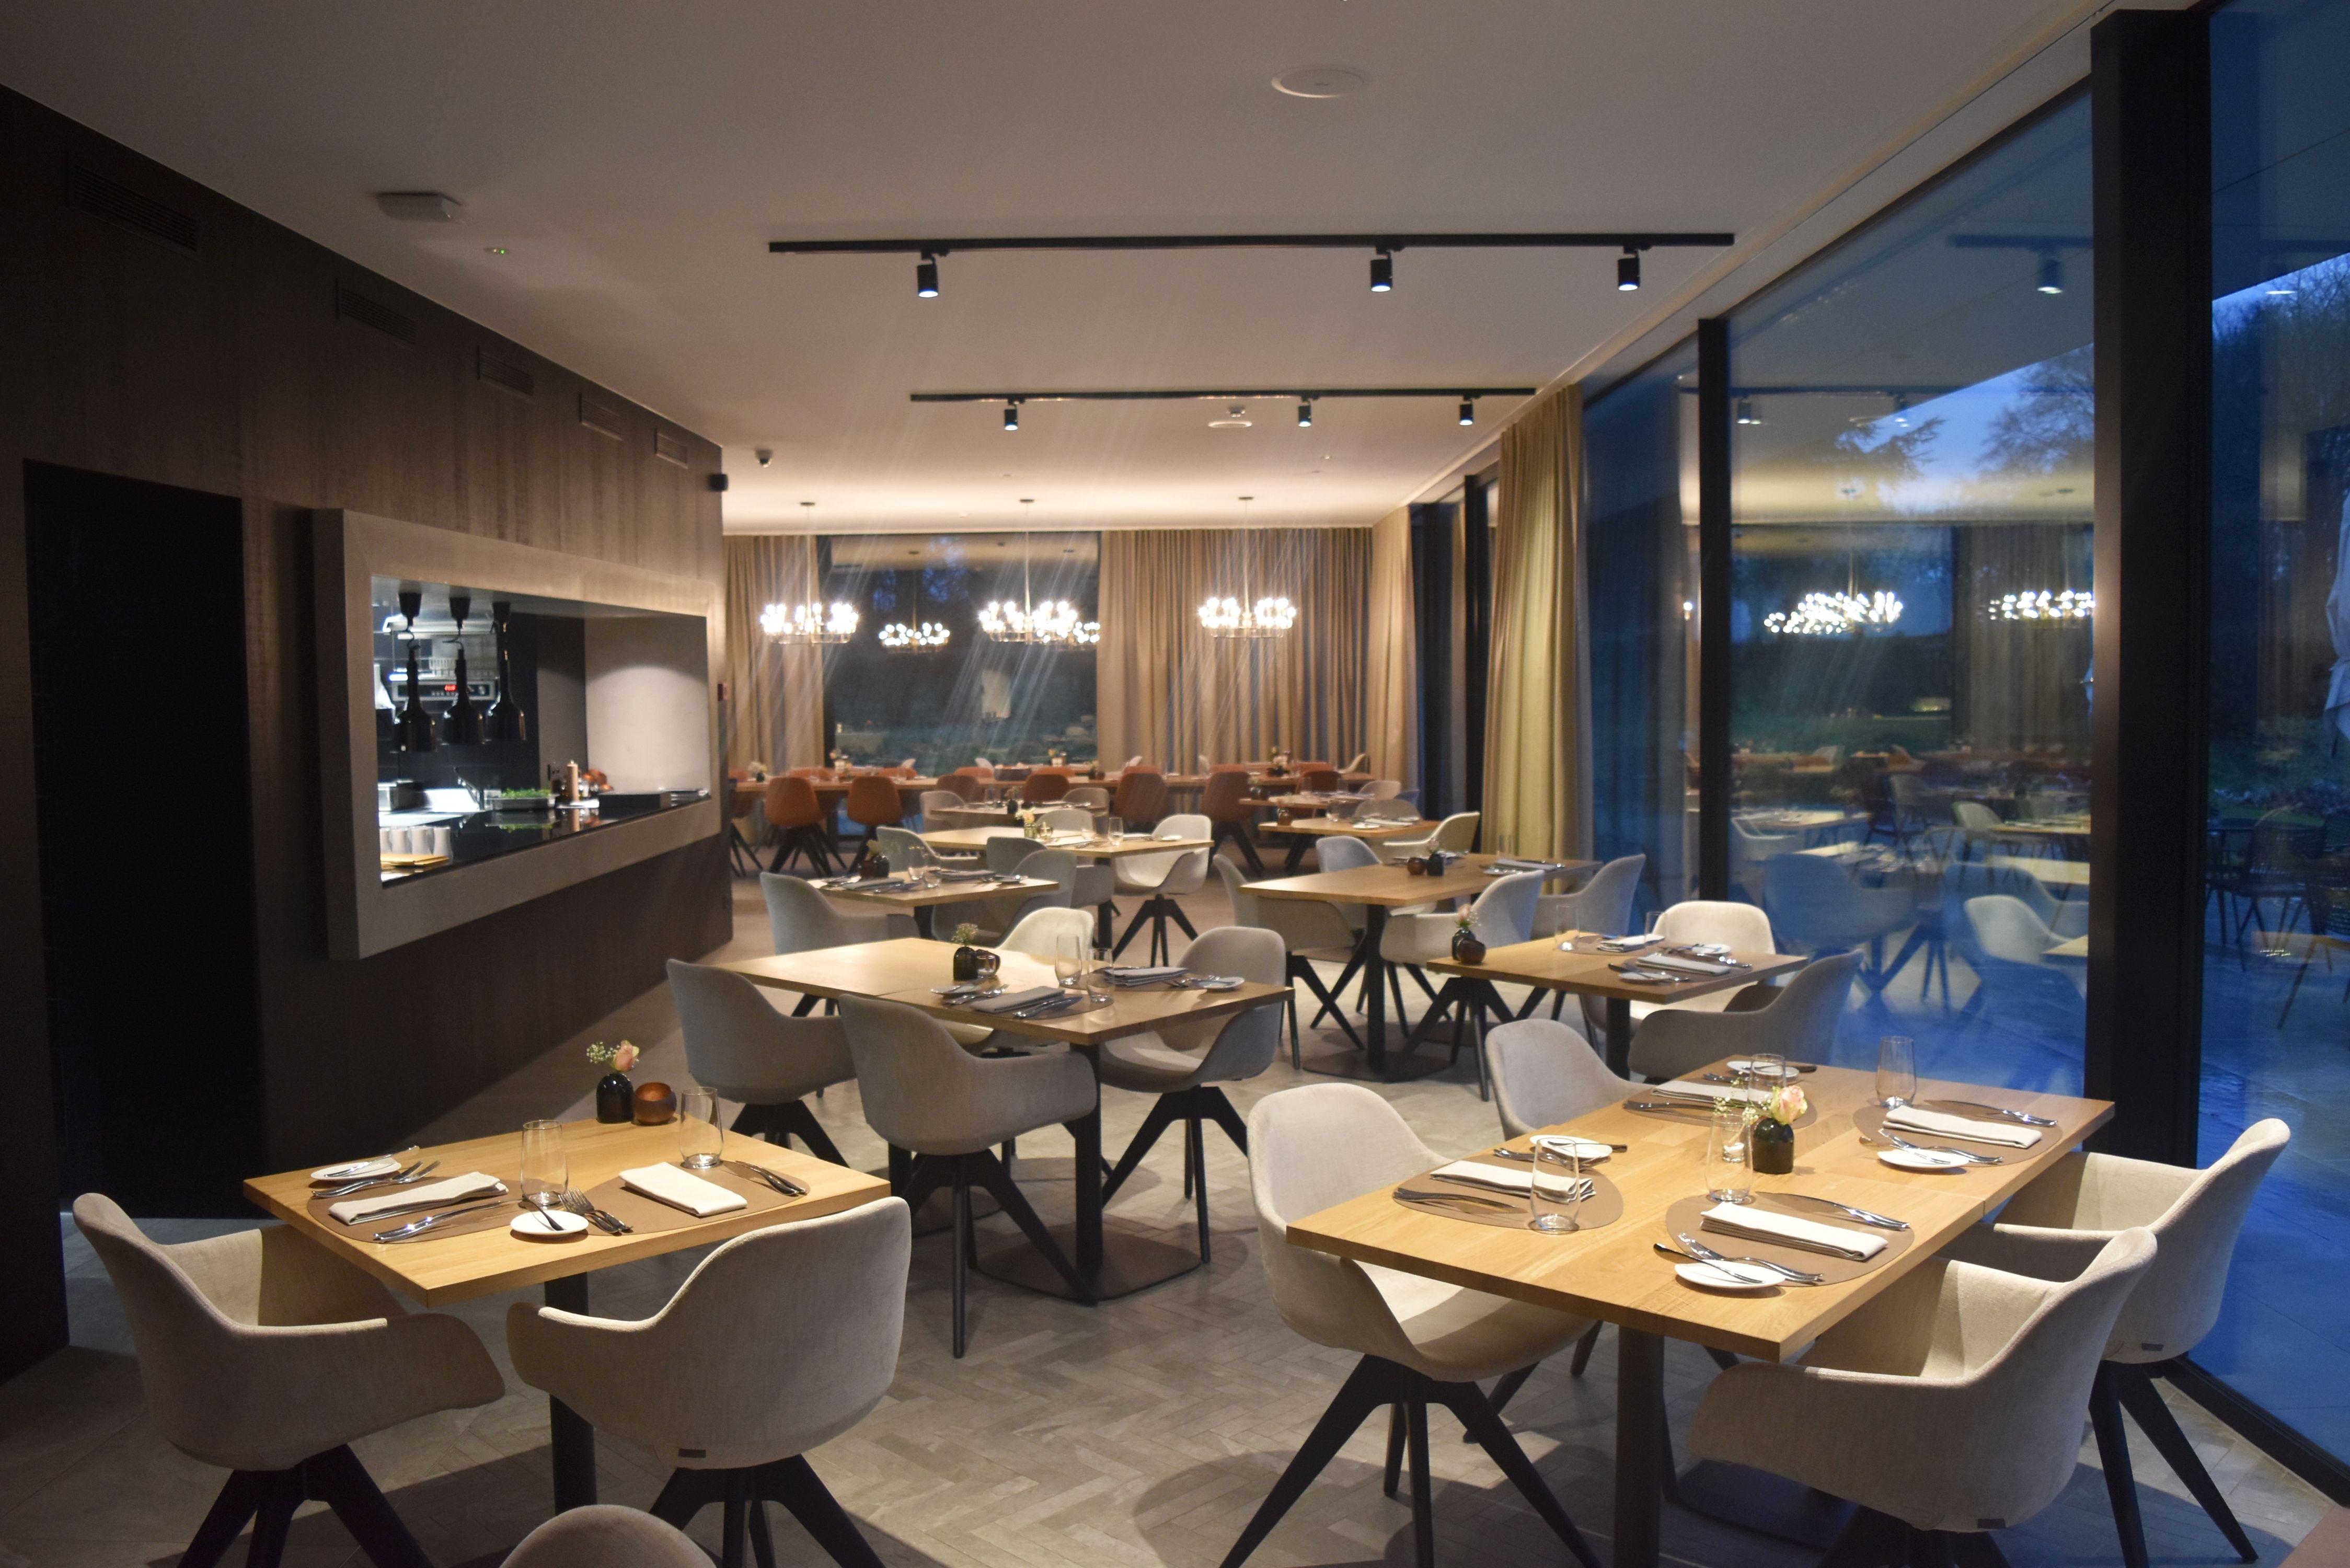 Hotel Martin's Rentmeesterij te Bilzen - Restaurant Akko